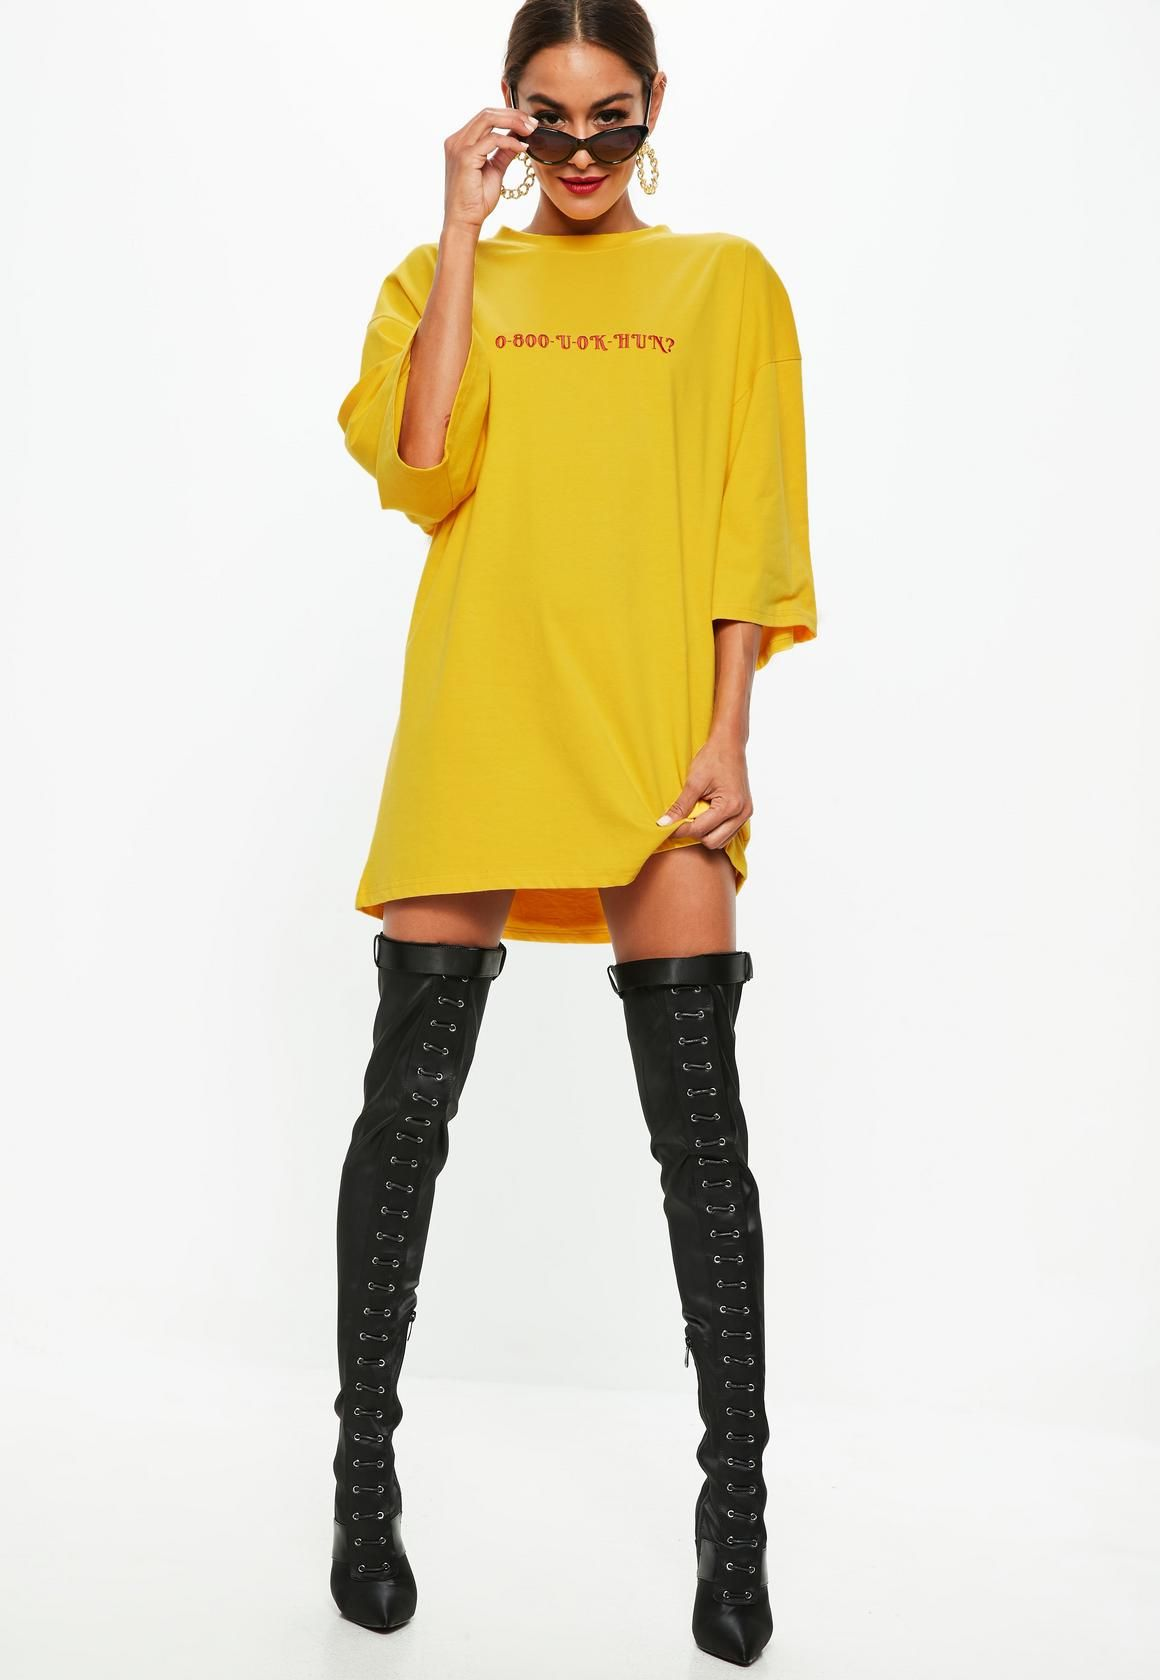 Missguided - Yellow Oversized Slogan T Shirt Dress f9b45233c